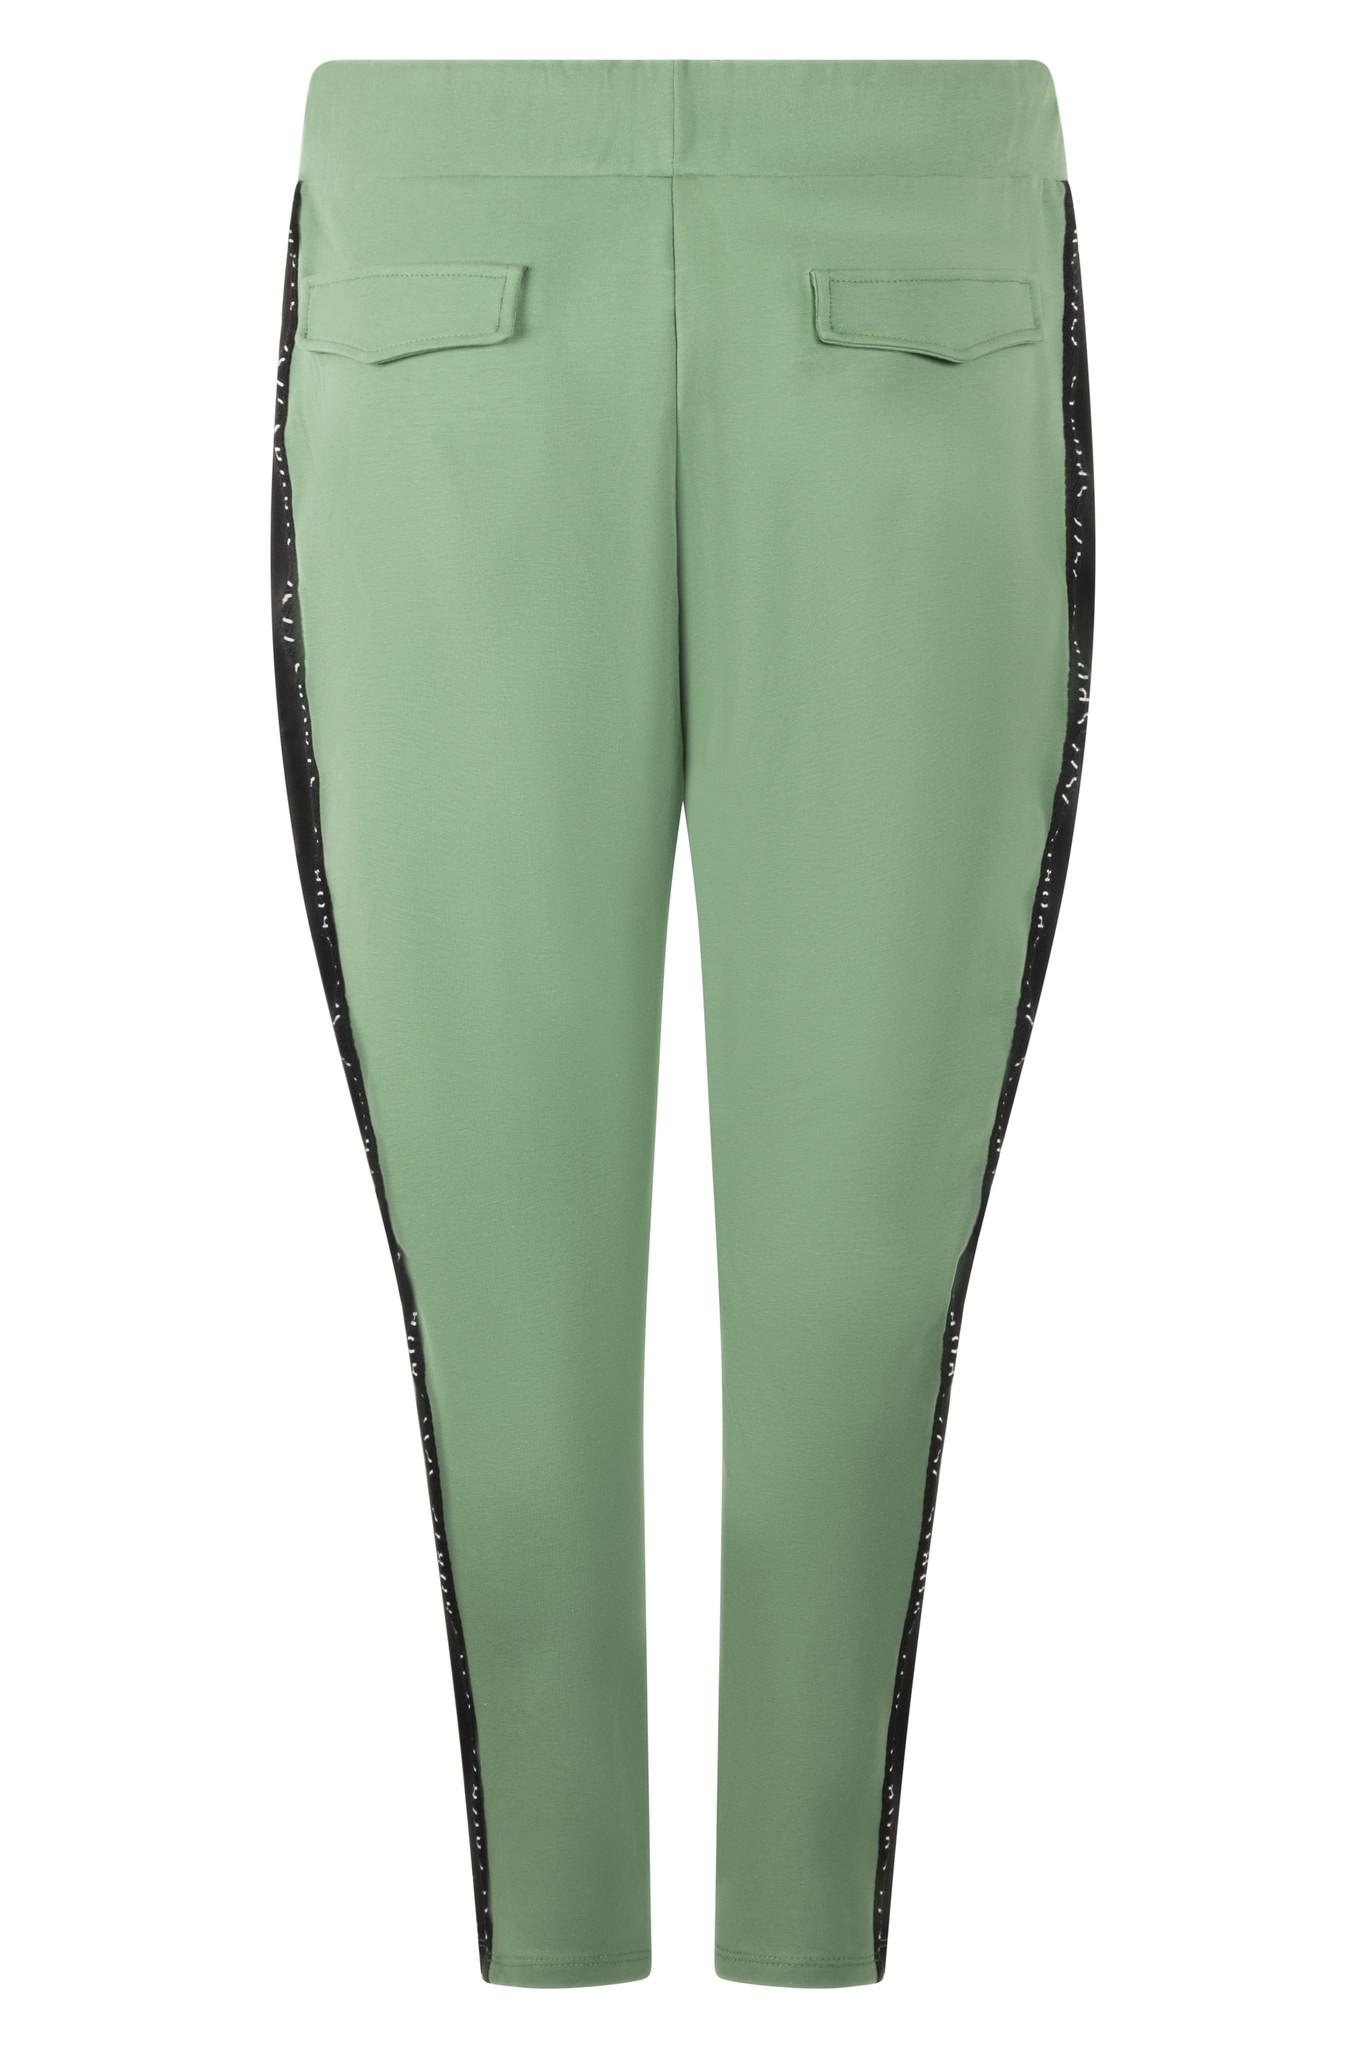 Zoso Zoso 215Fresh broek sporty sweat green/black